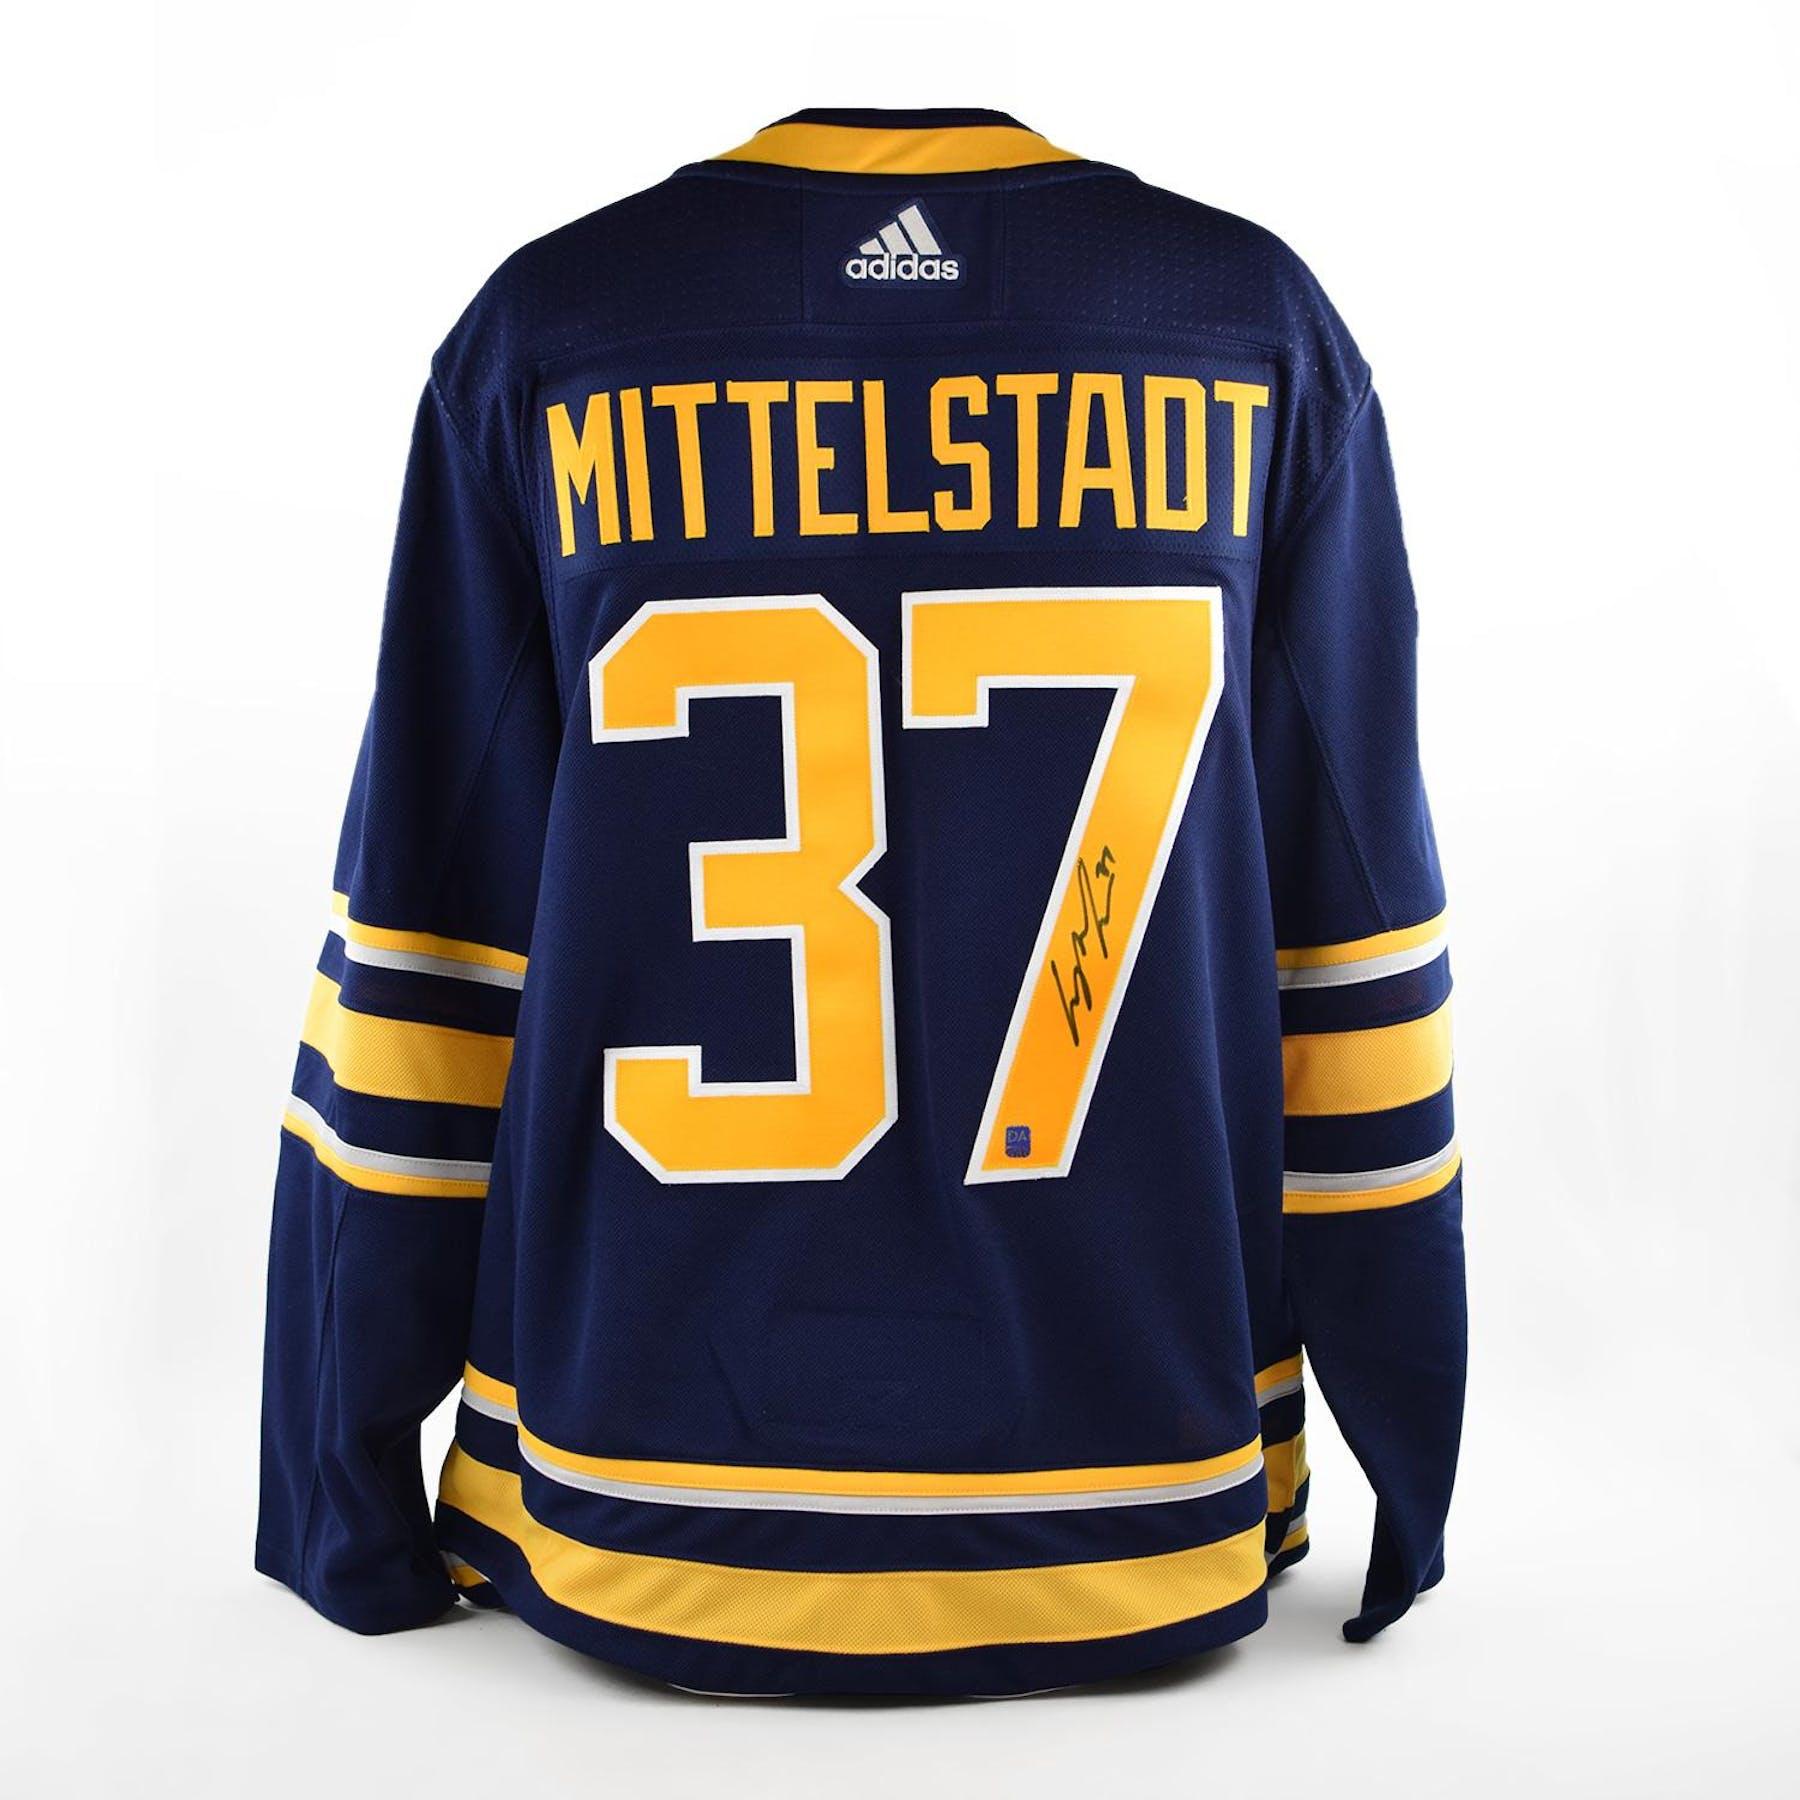 c0f52f84a Casey Mittelstadt Autographed Buffalo Sabres Blue Hockey Jersey | DA Card  World